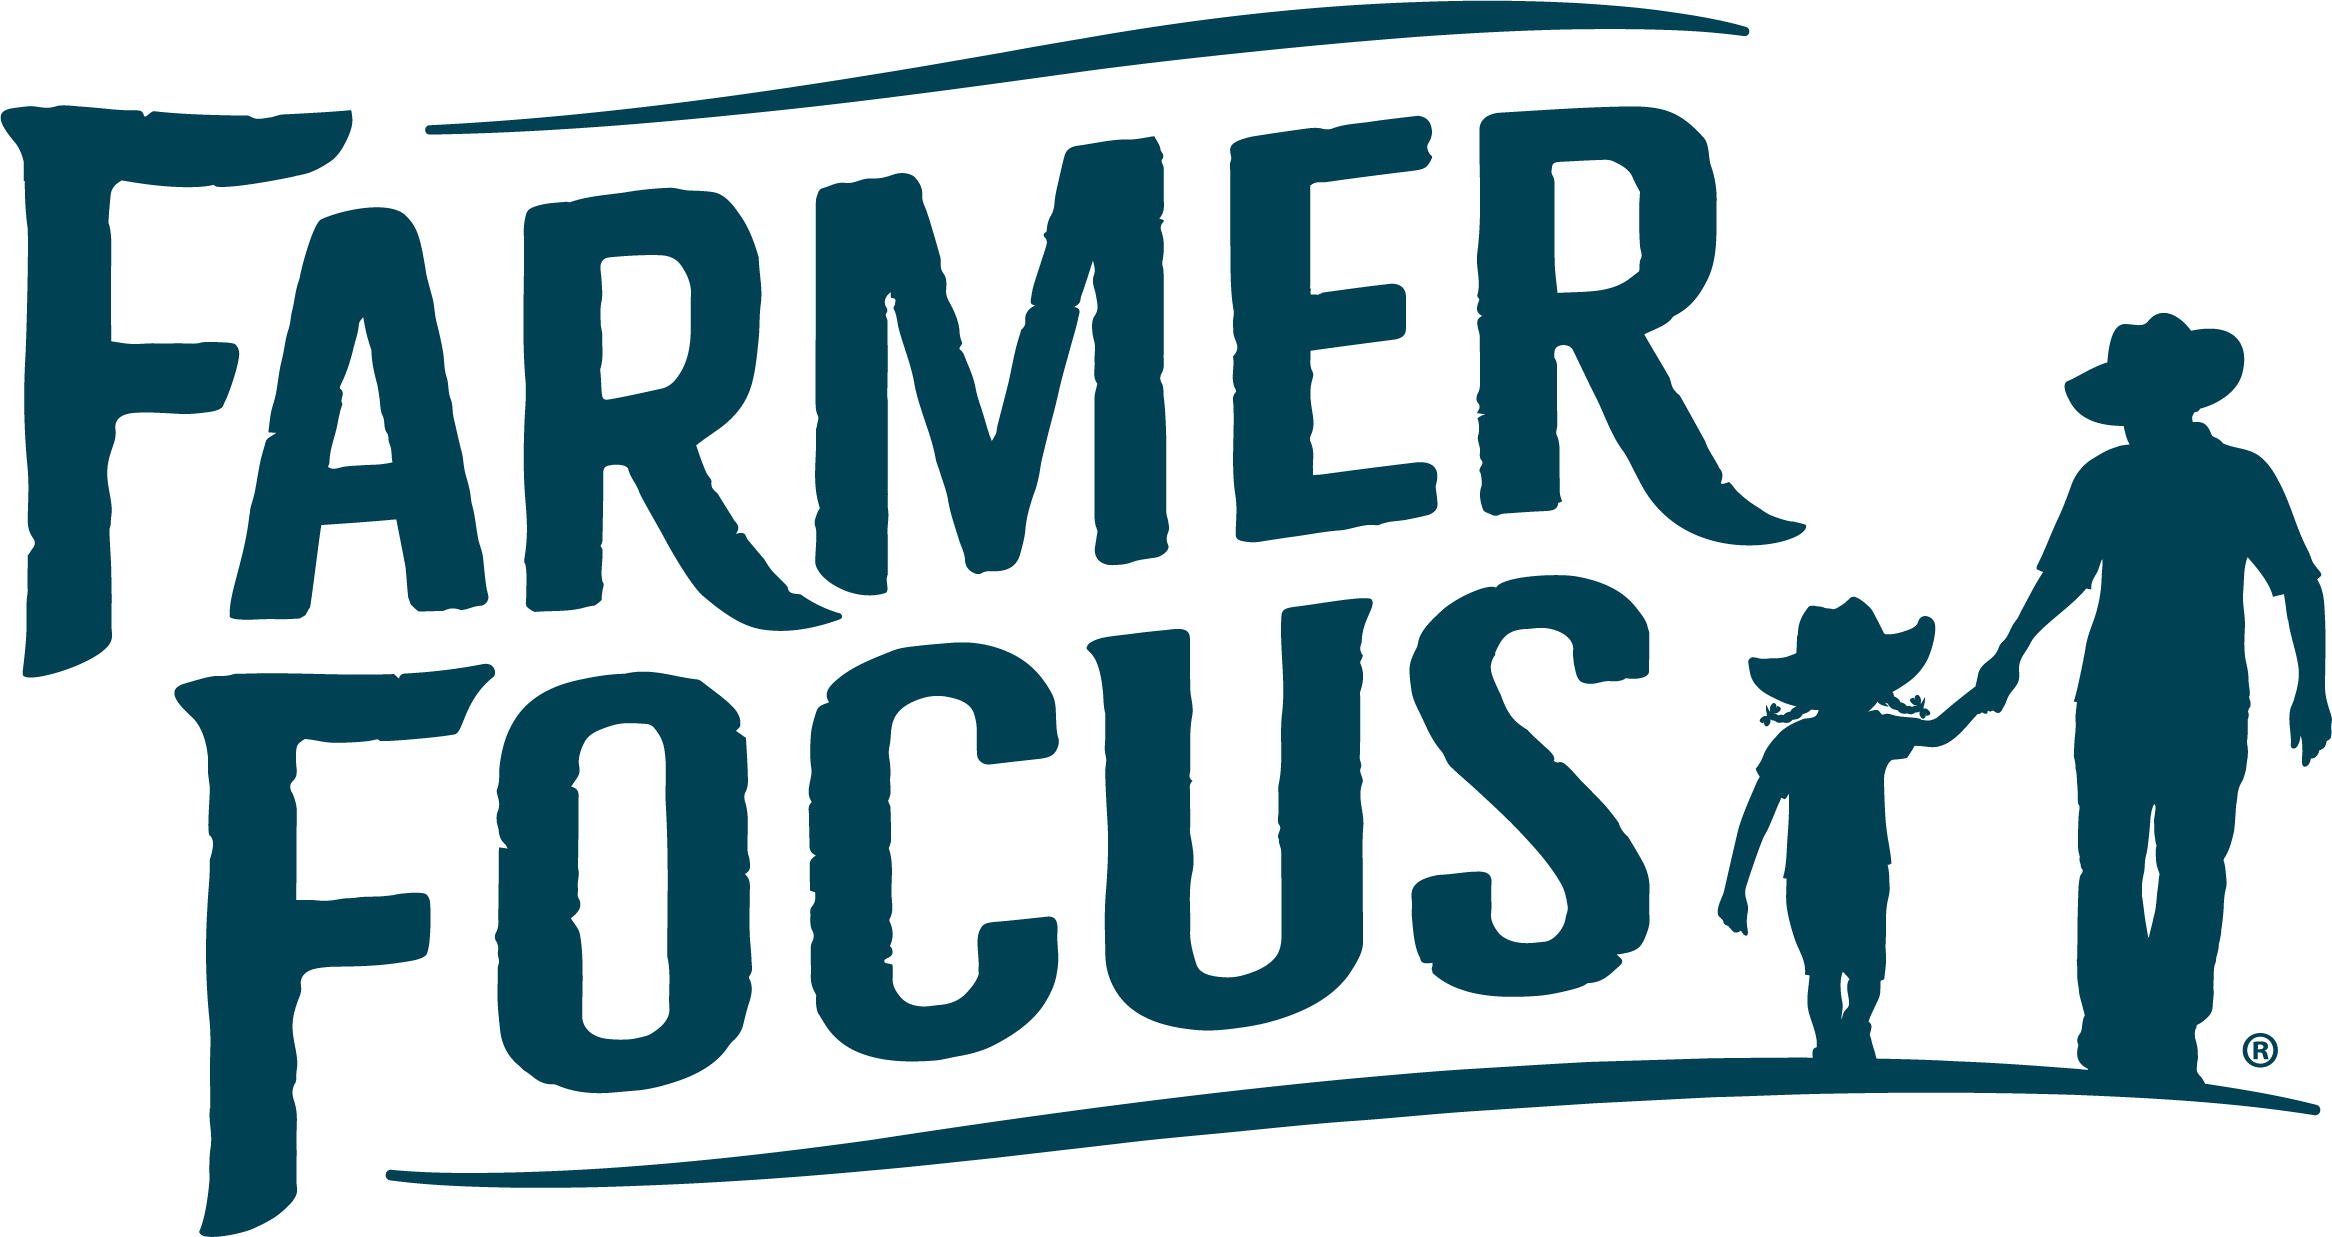 Photo: Farmer Focus Logo.